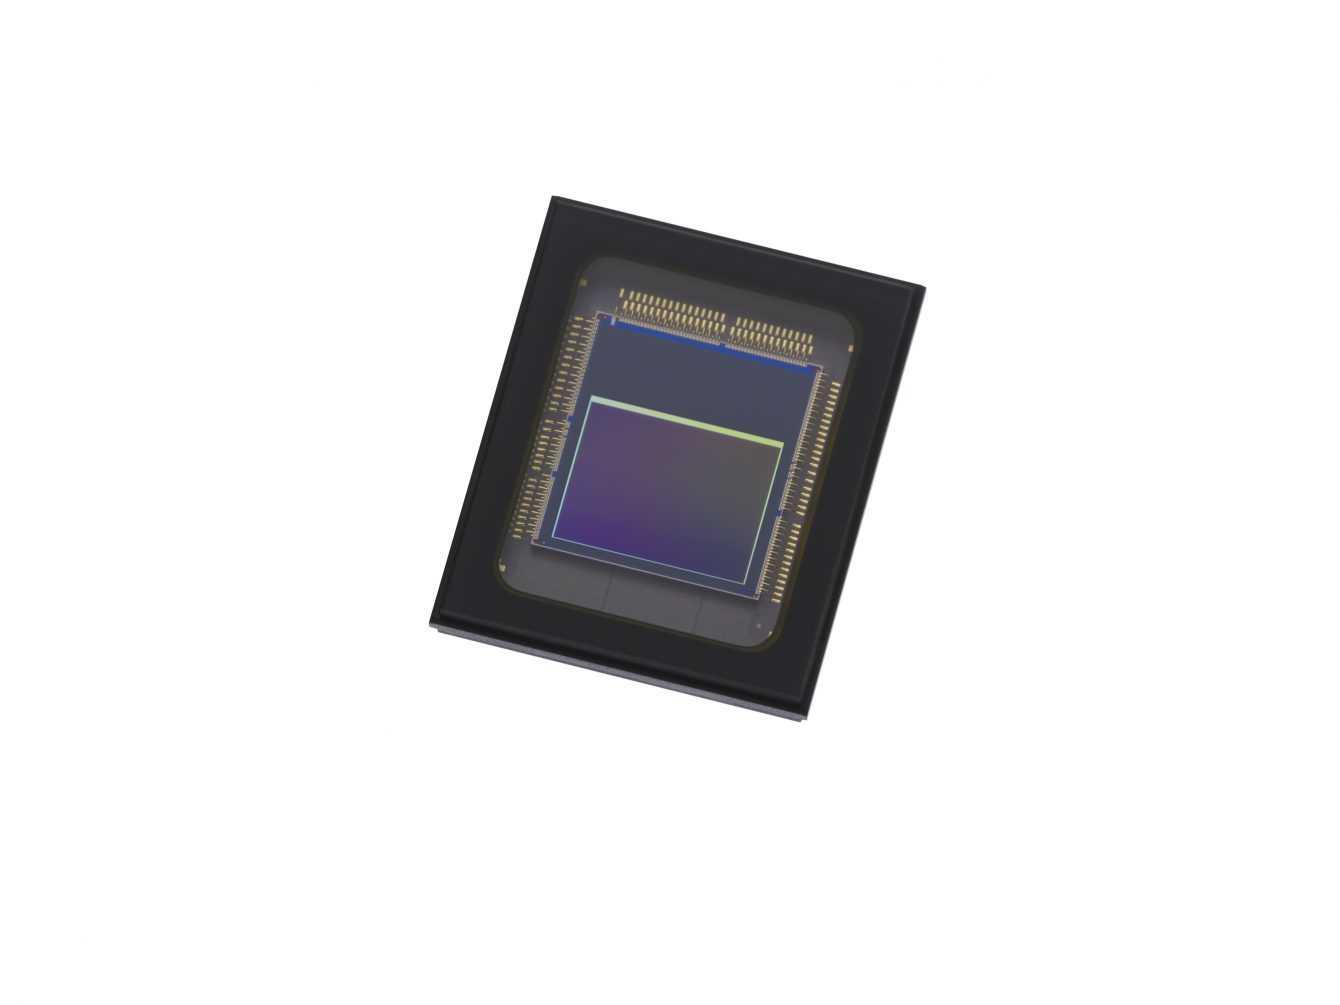 Sony: i primi sensori d'immagine intelligenti basati su IA